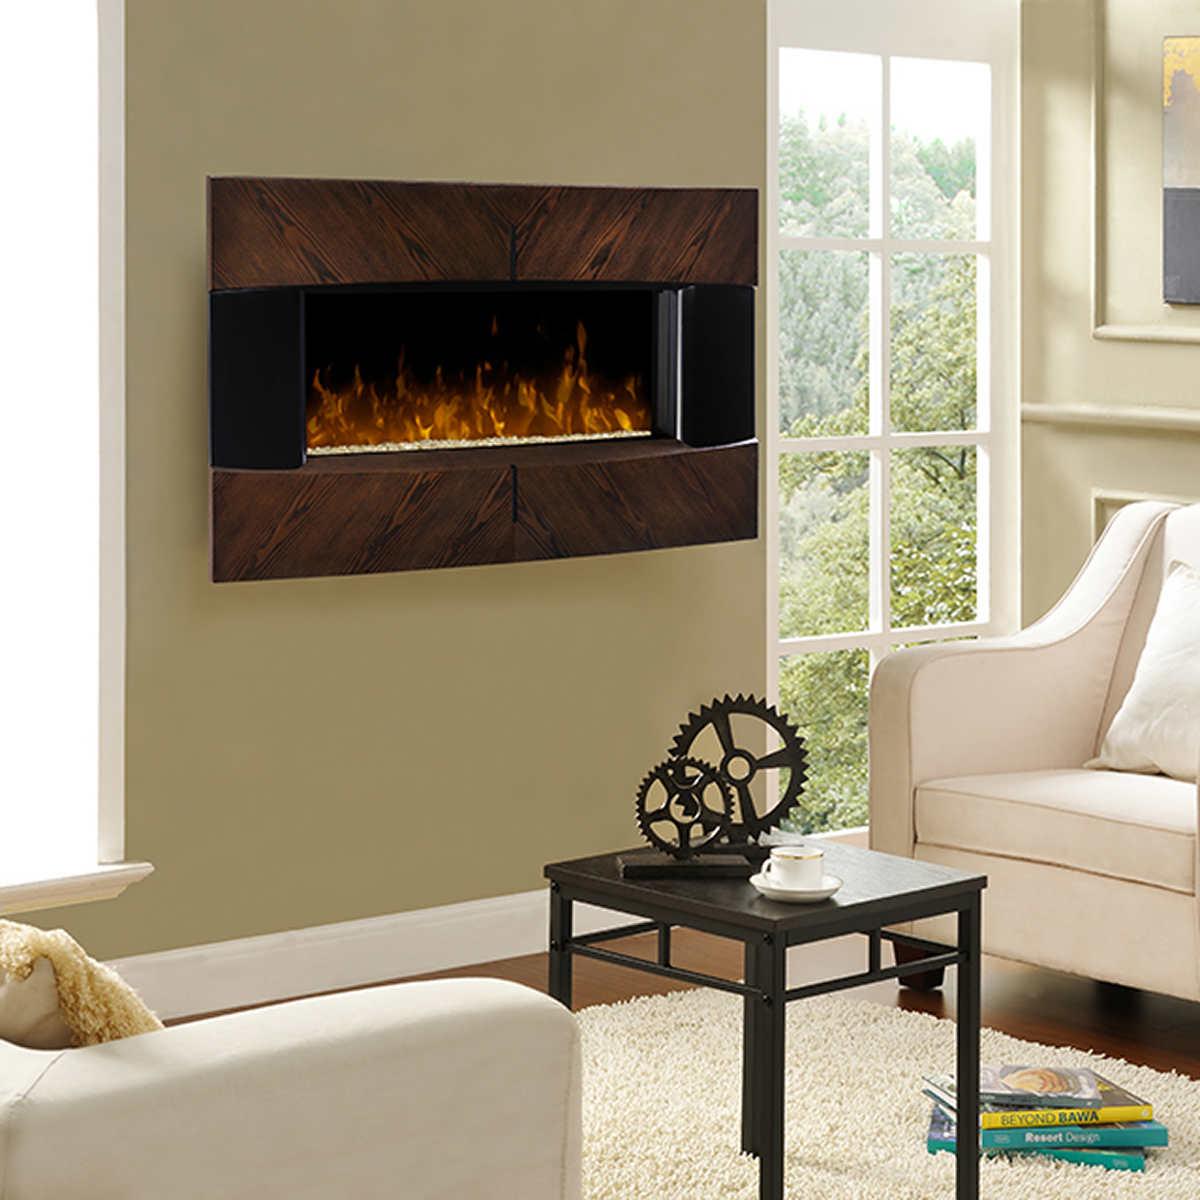 Harrington Wall Mount Electric Fireplace - Fireplaces